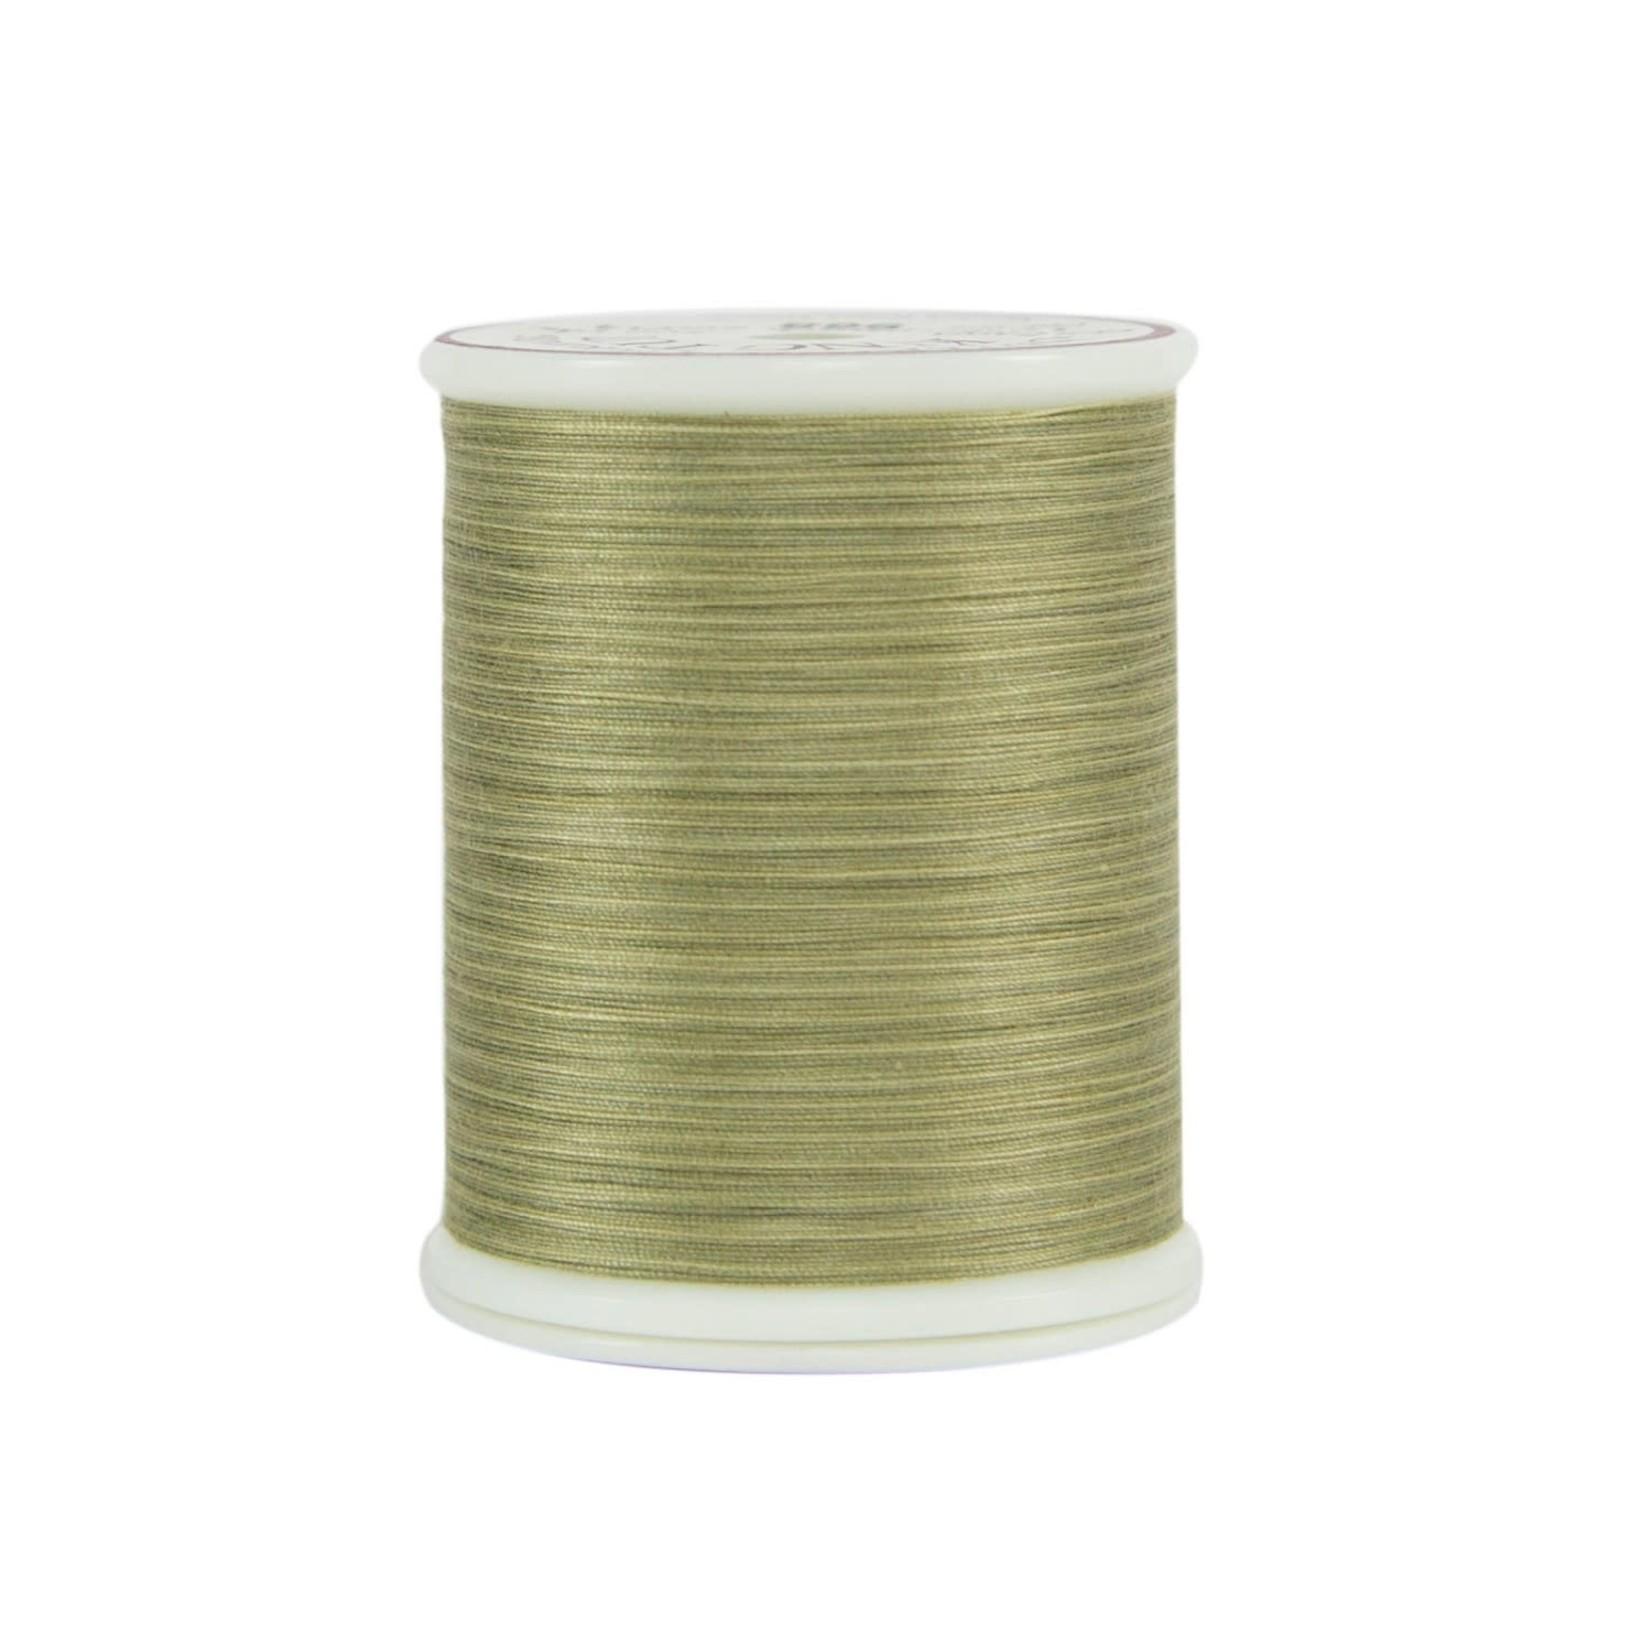 Superior Threads King Tut - #40 - 457 m - 0968 Fig